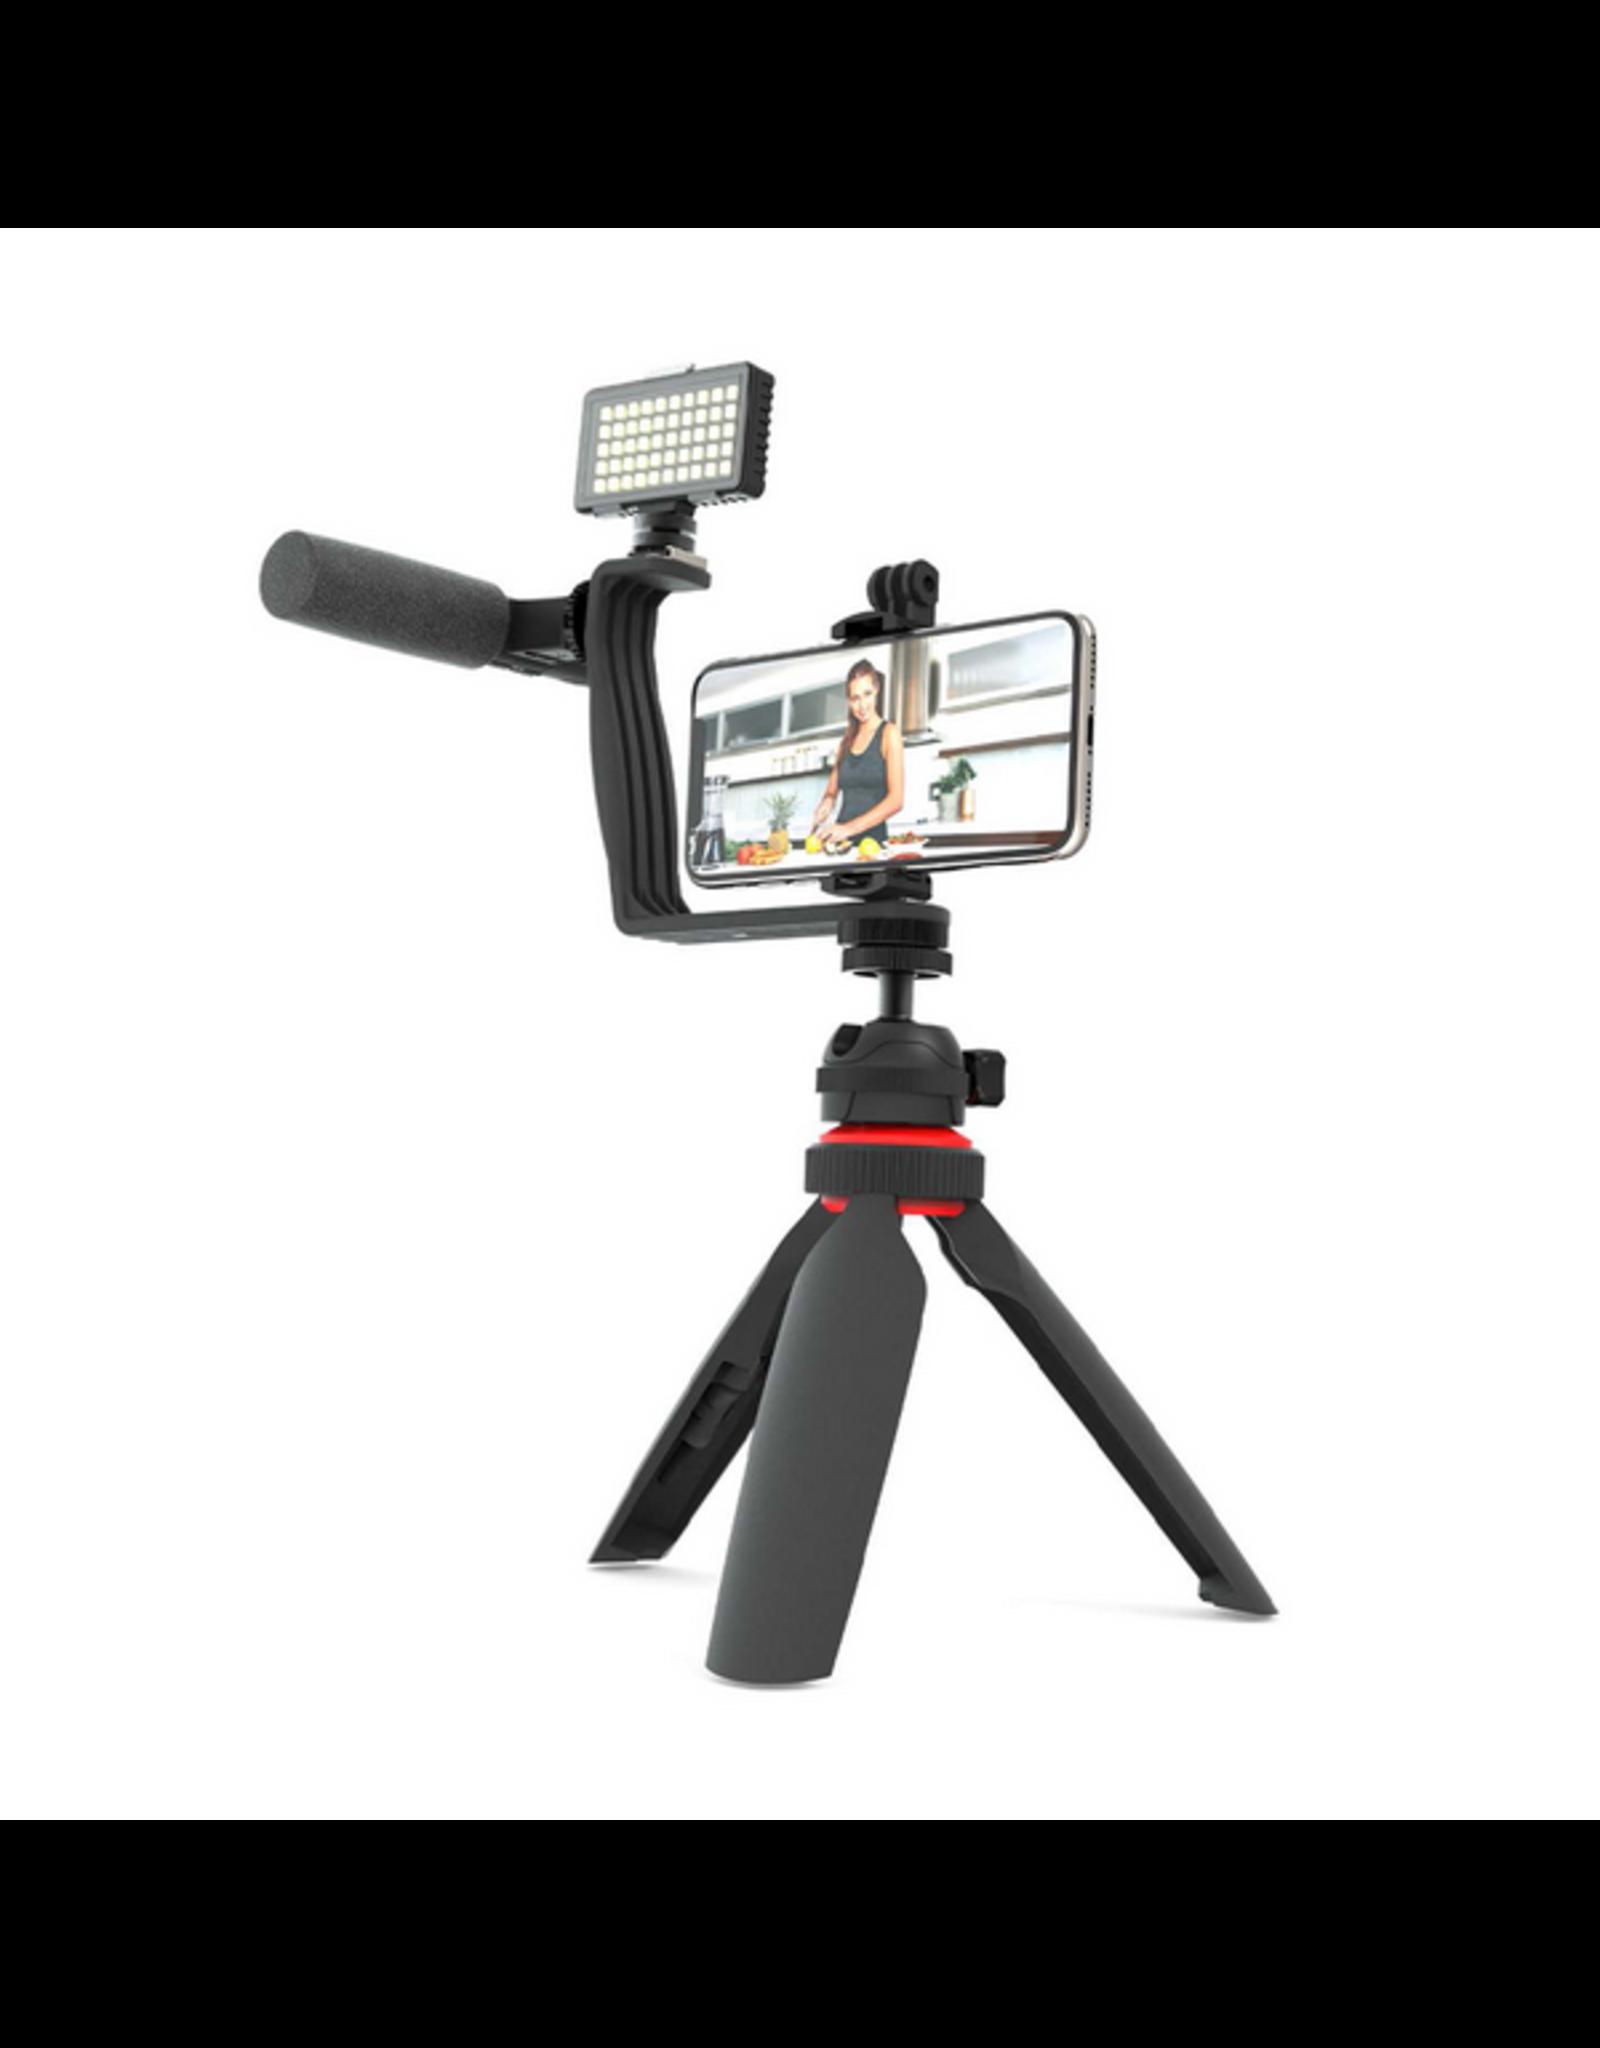 Digipower Digipower Vlogging Essentials 5pcs Mic/Light/Tripo/Hold/Brac SKU:50451